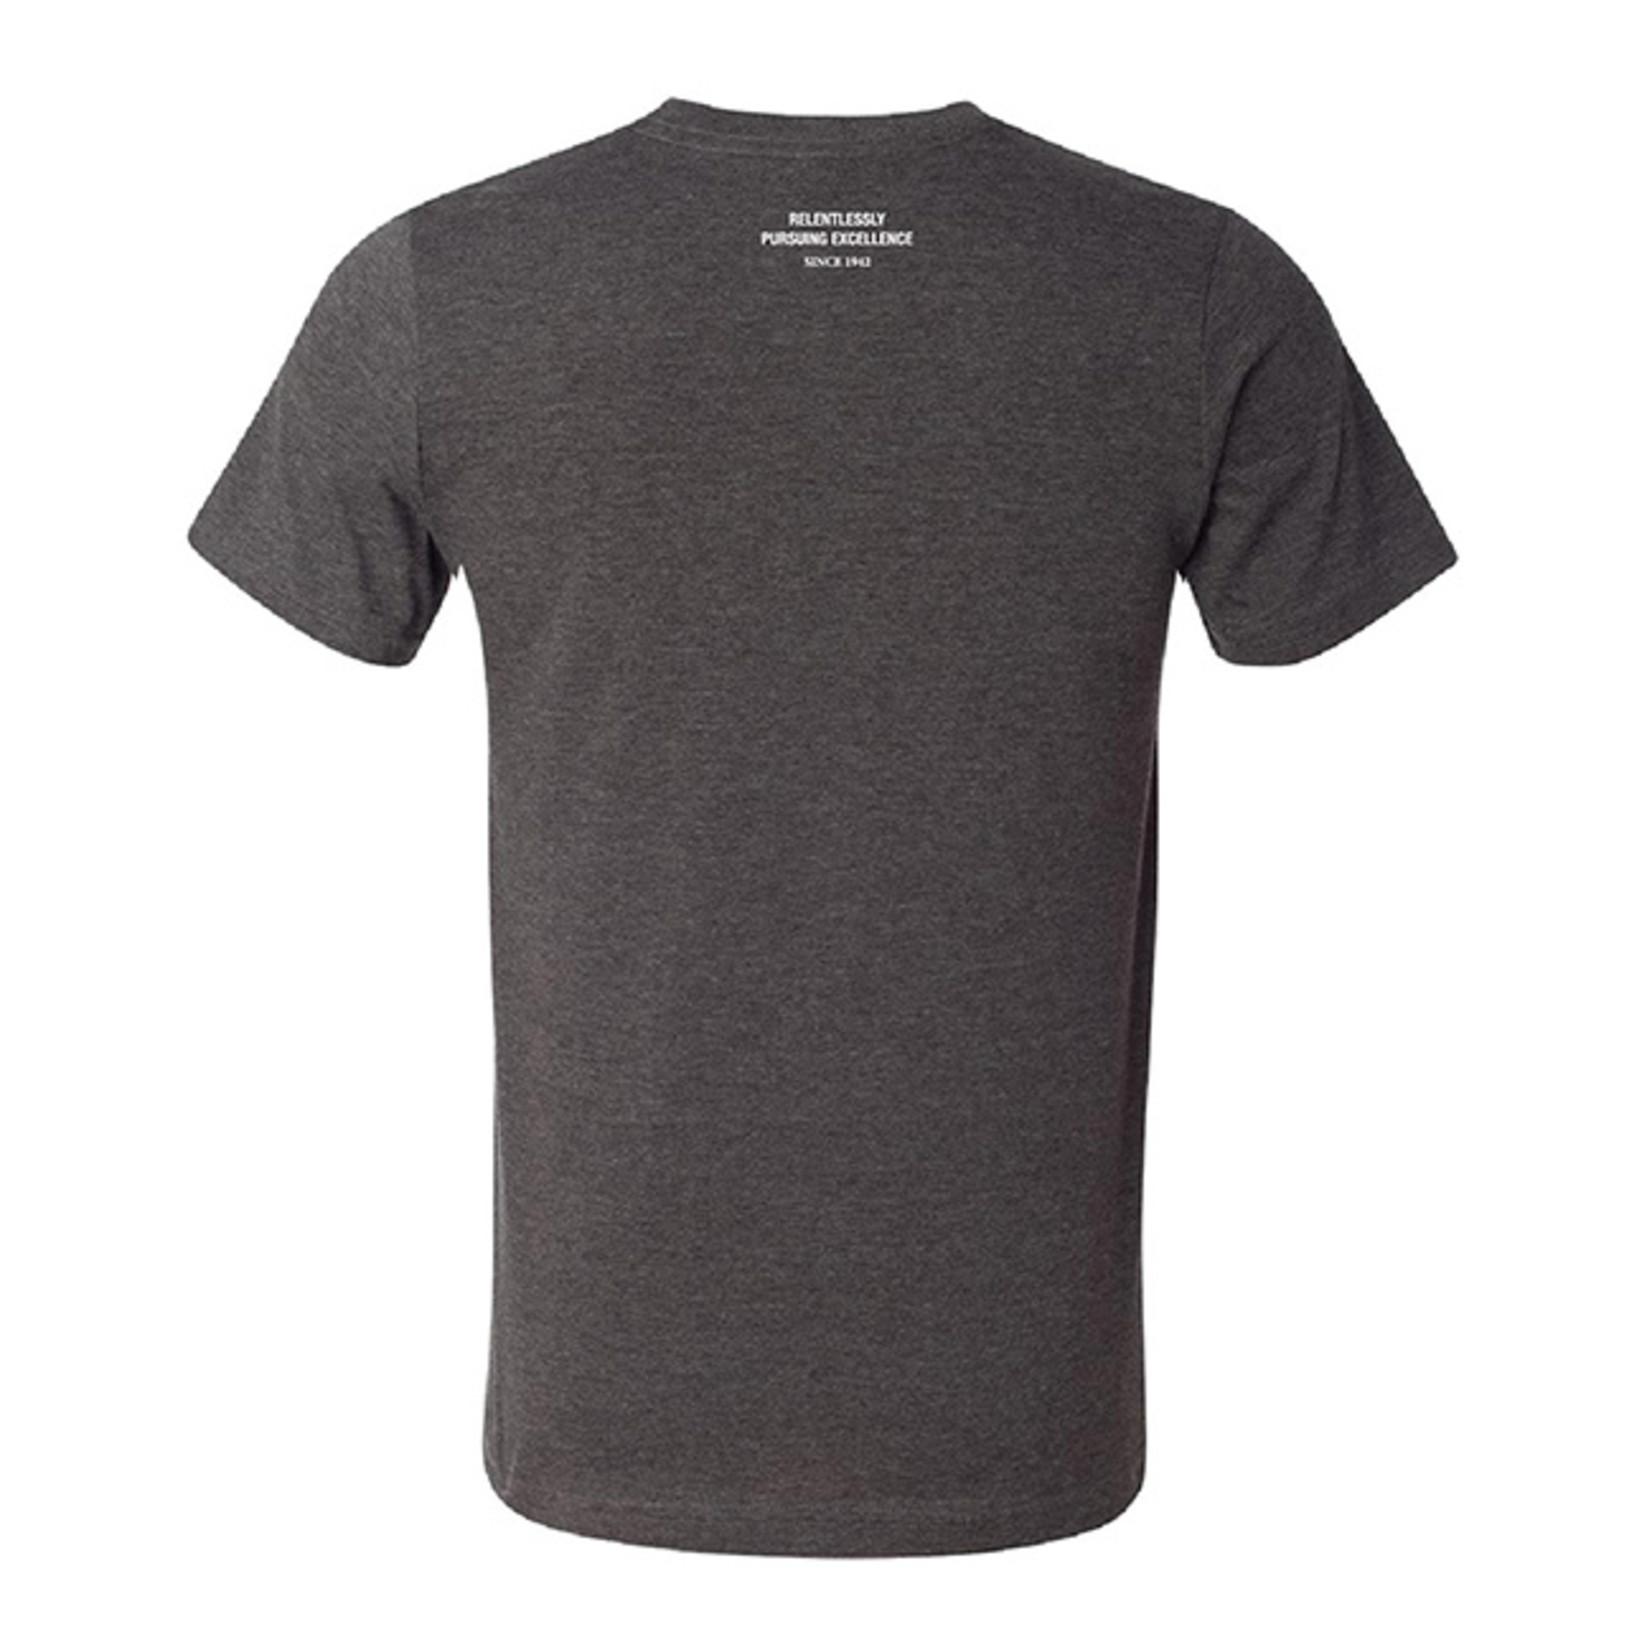 Green Giftz Legacy T-Shirt - GROH SHIELD